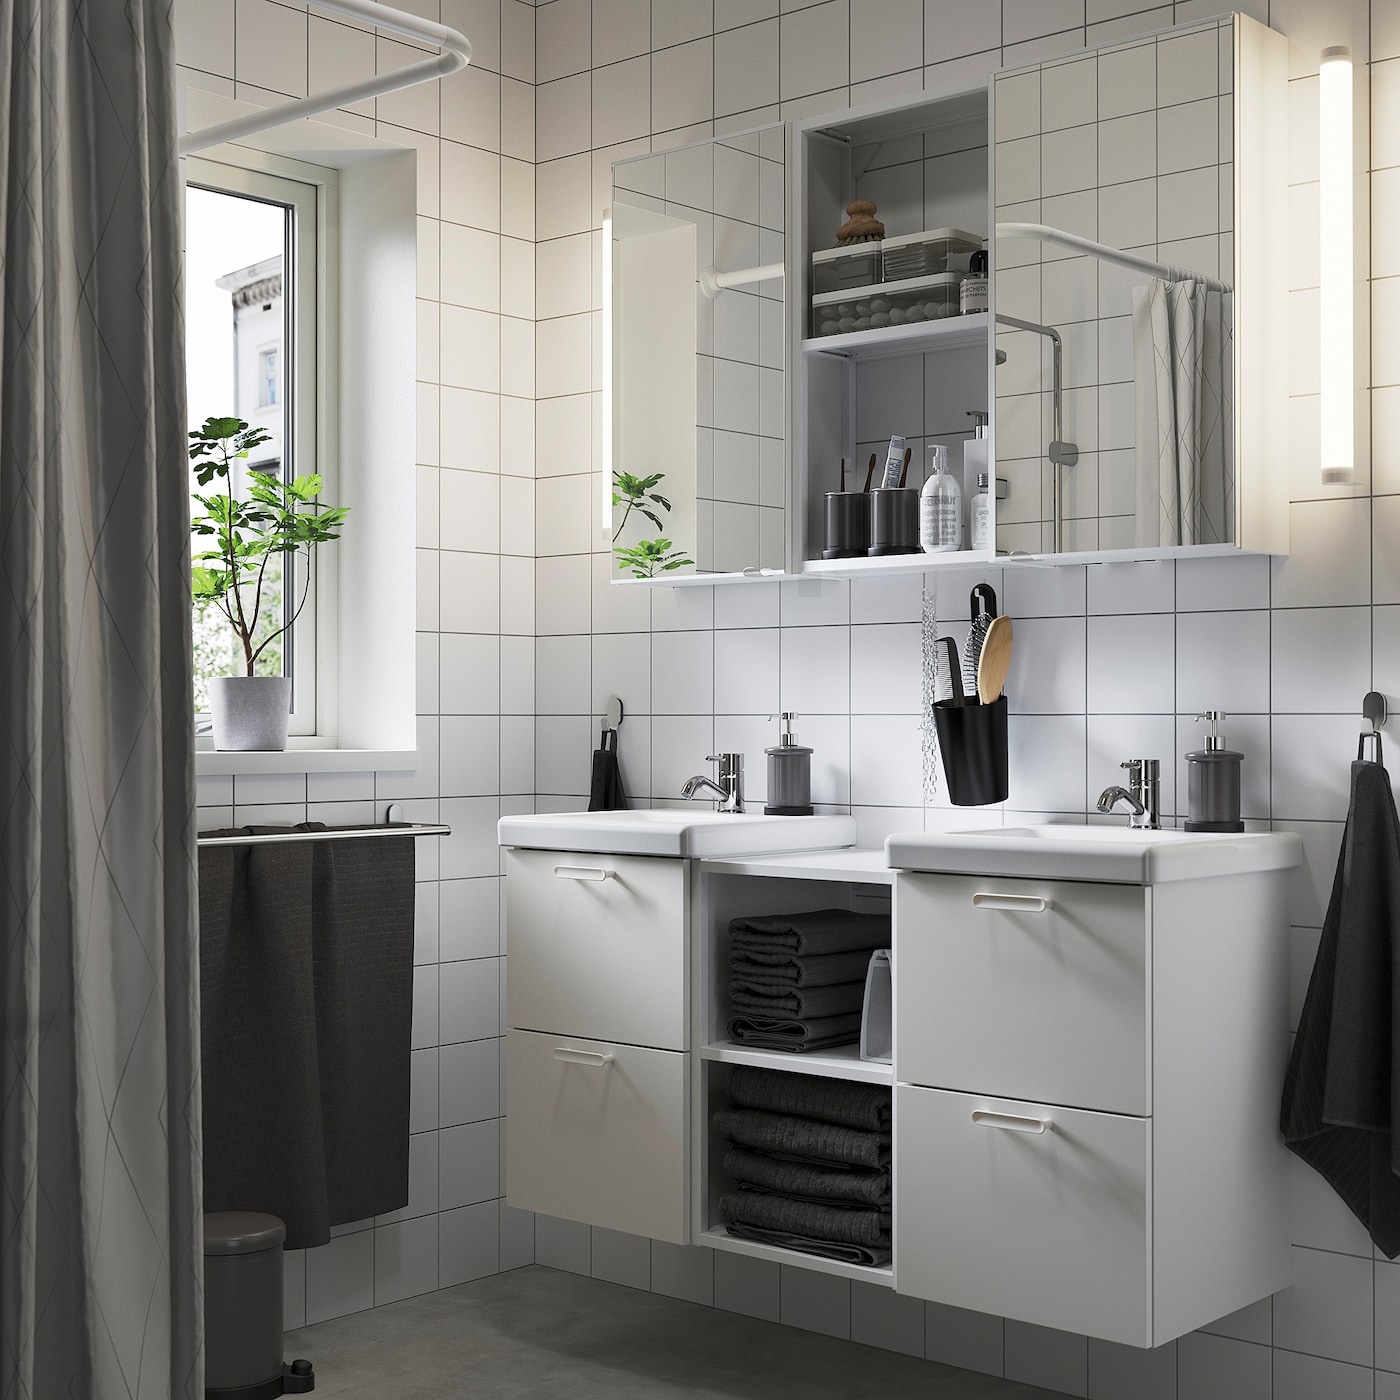 ENHET / TVÄLLEN Bathroom furniture, set of 22, white/Pilkån tap, 124x43x65 cm